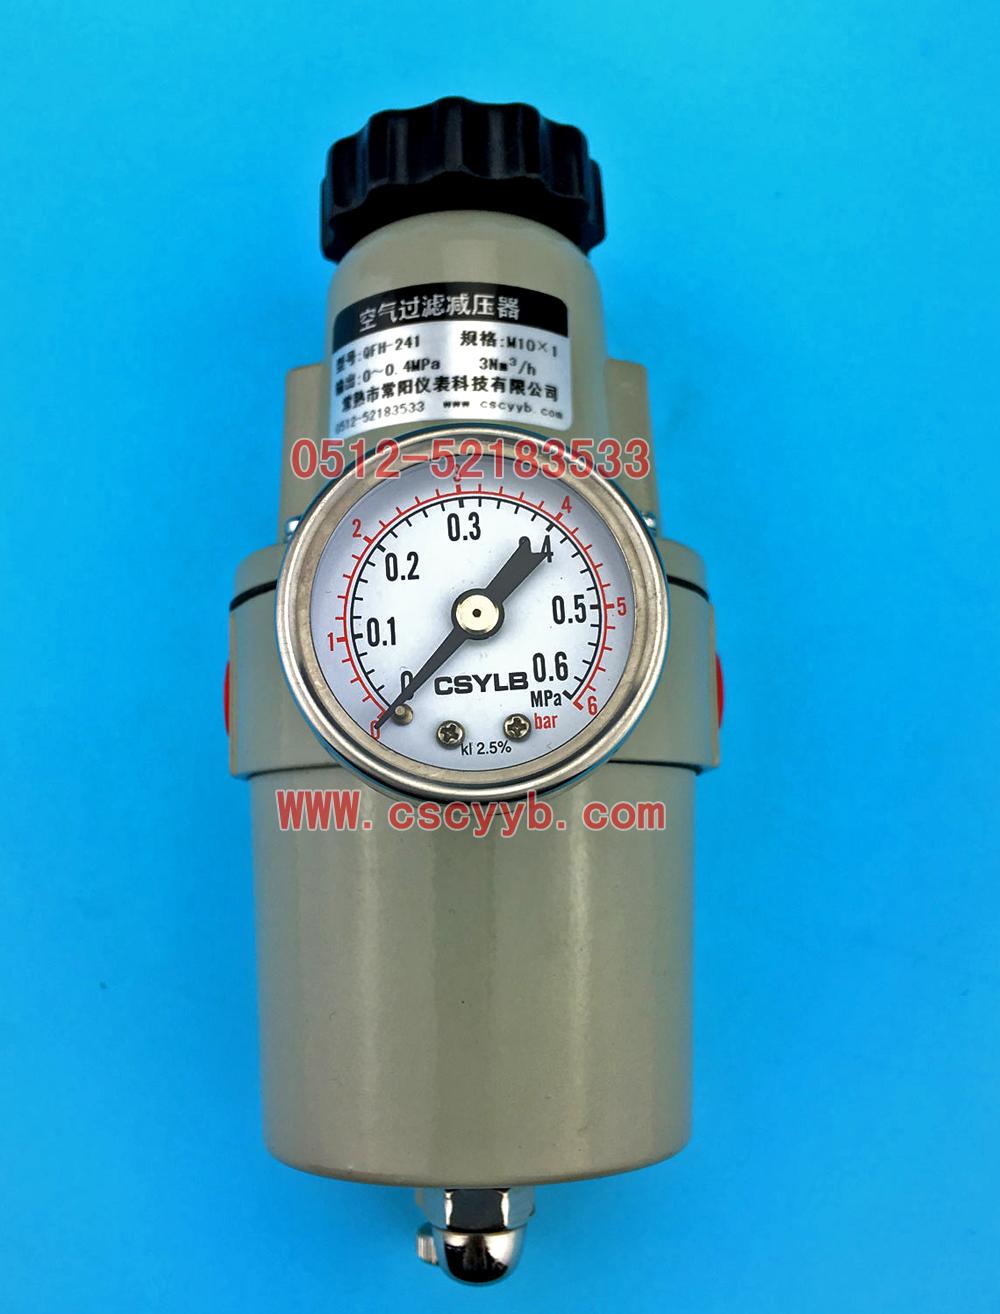 QFH-213空气过滤减压阀;QFH-221空气过滤减压阀;QFH-222空气过滤减压阀;QFH-223空气过滤减压阀